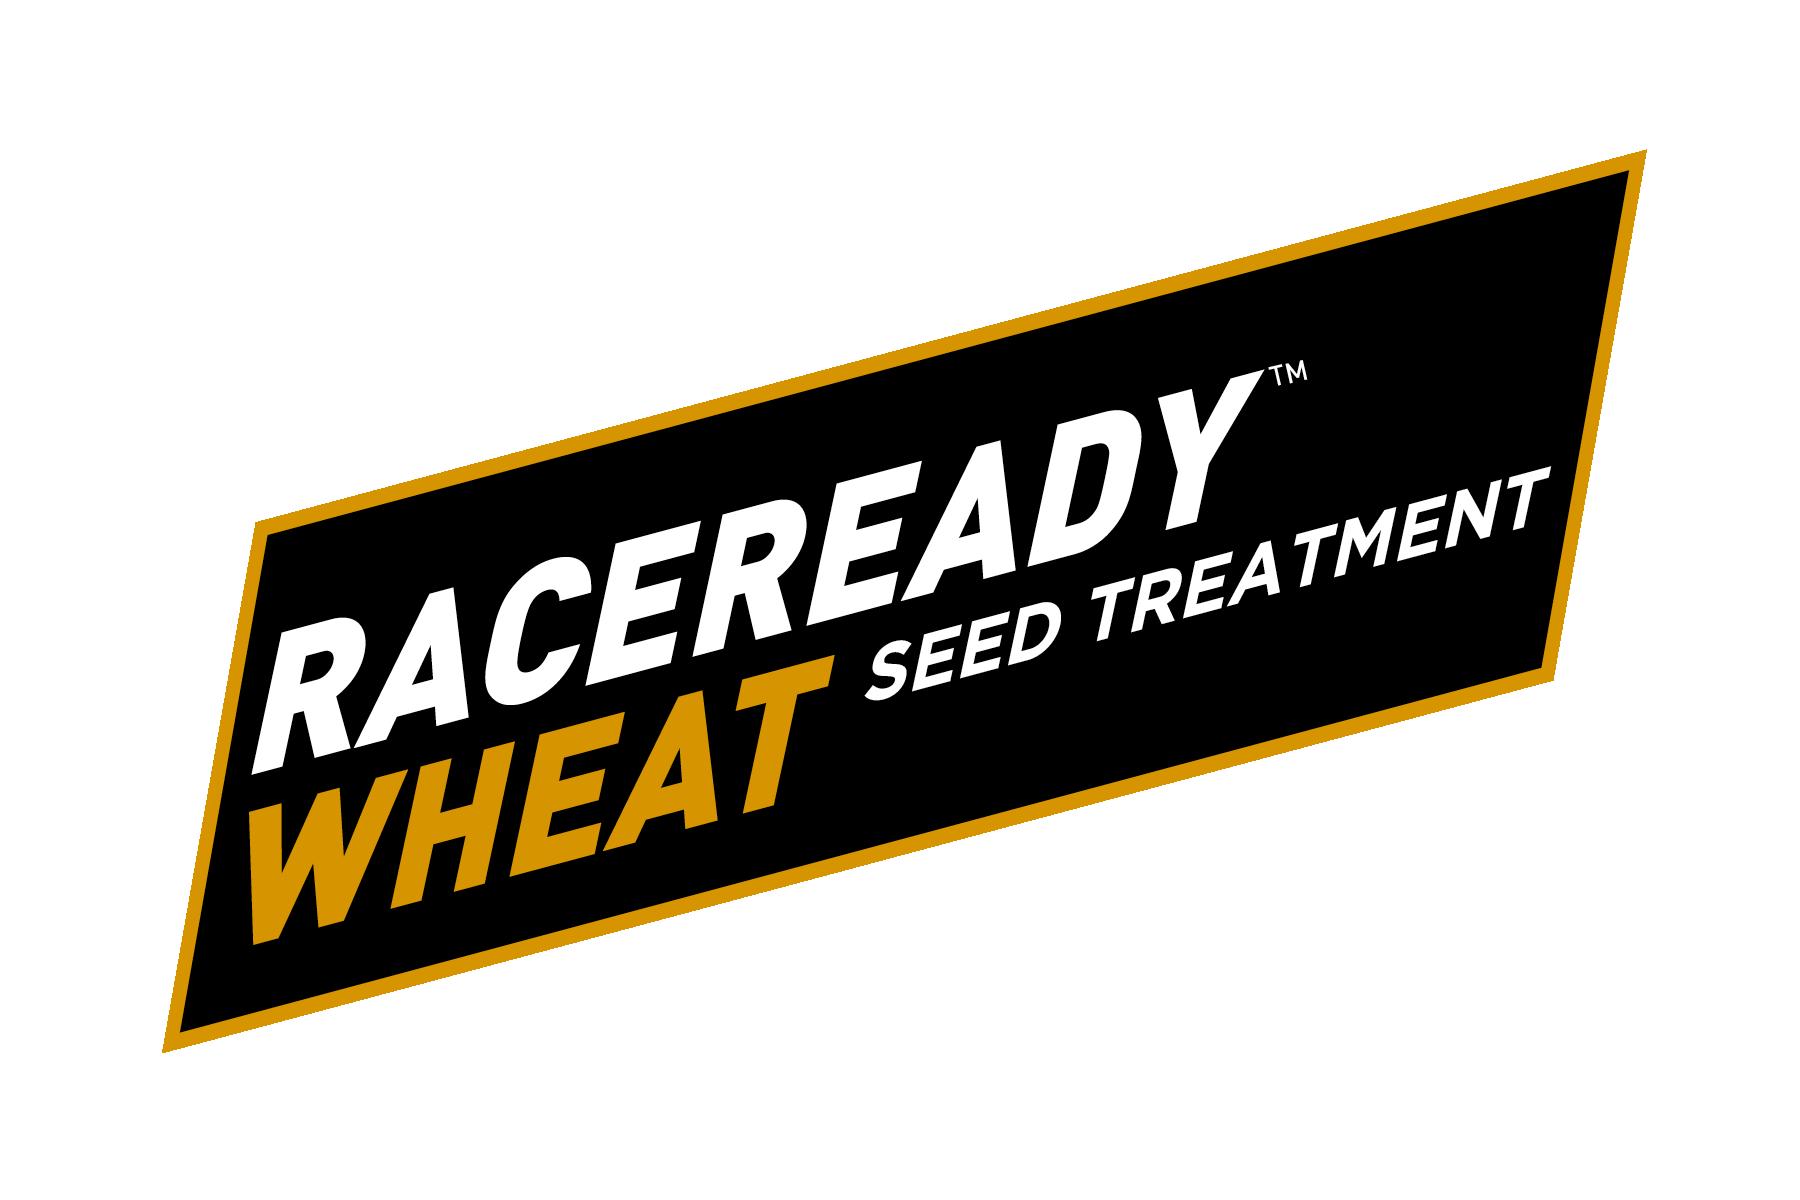 RACEREADY™ Wheat